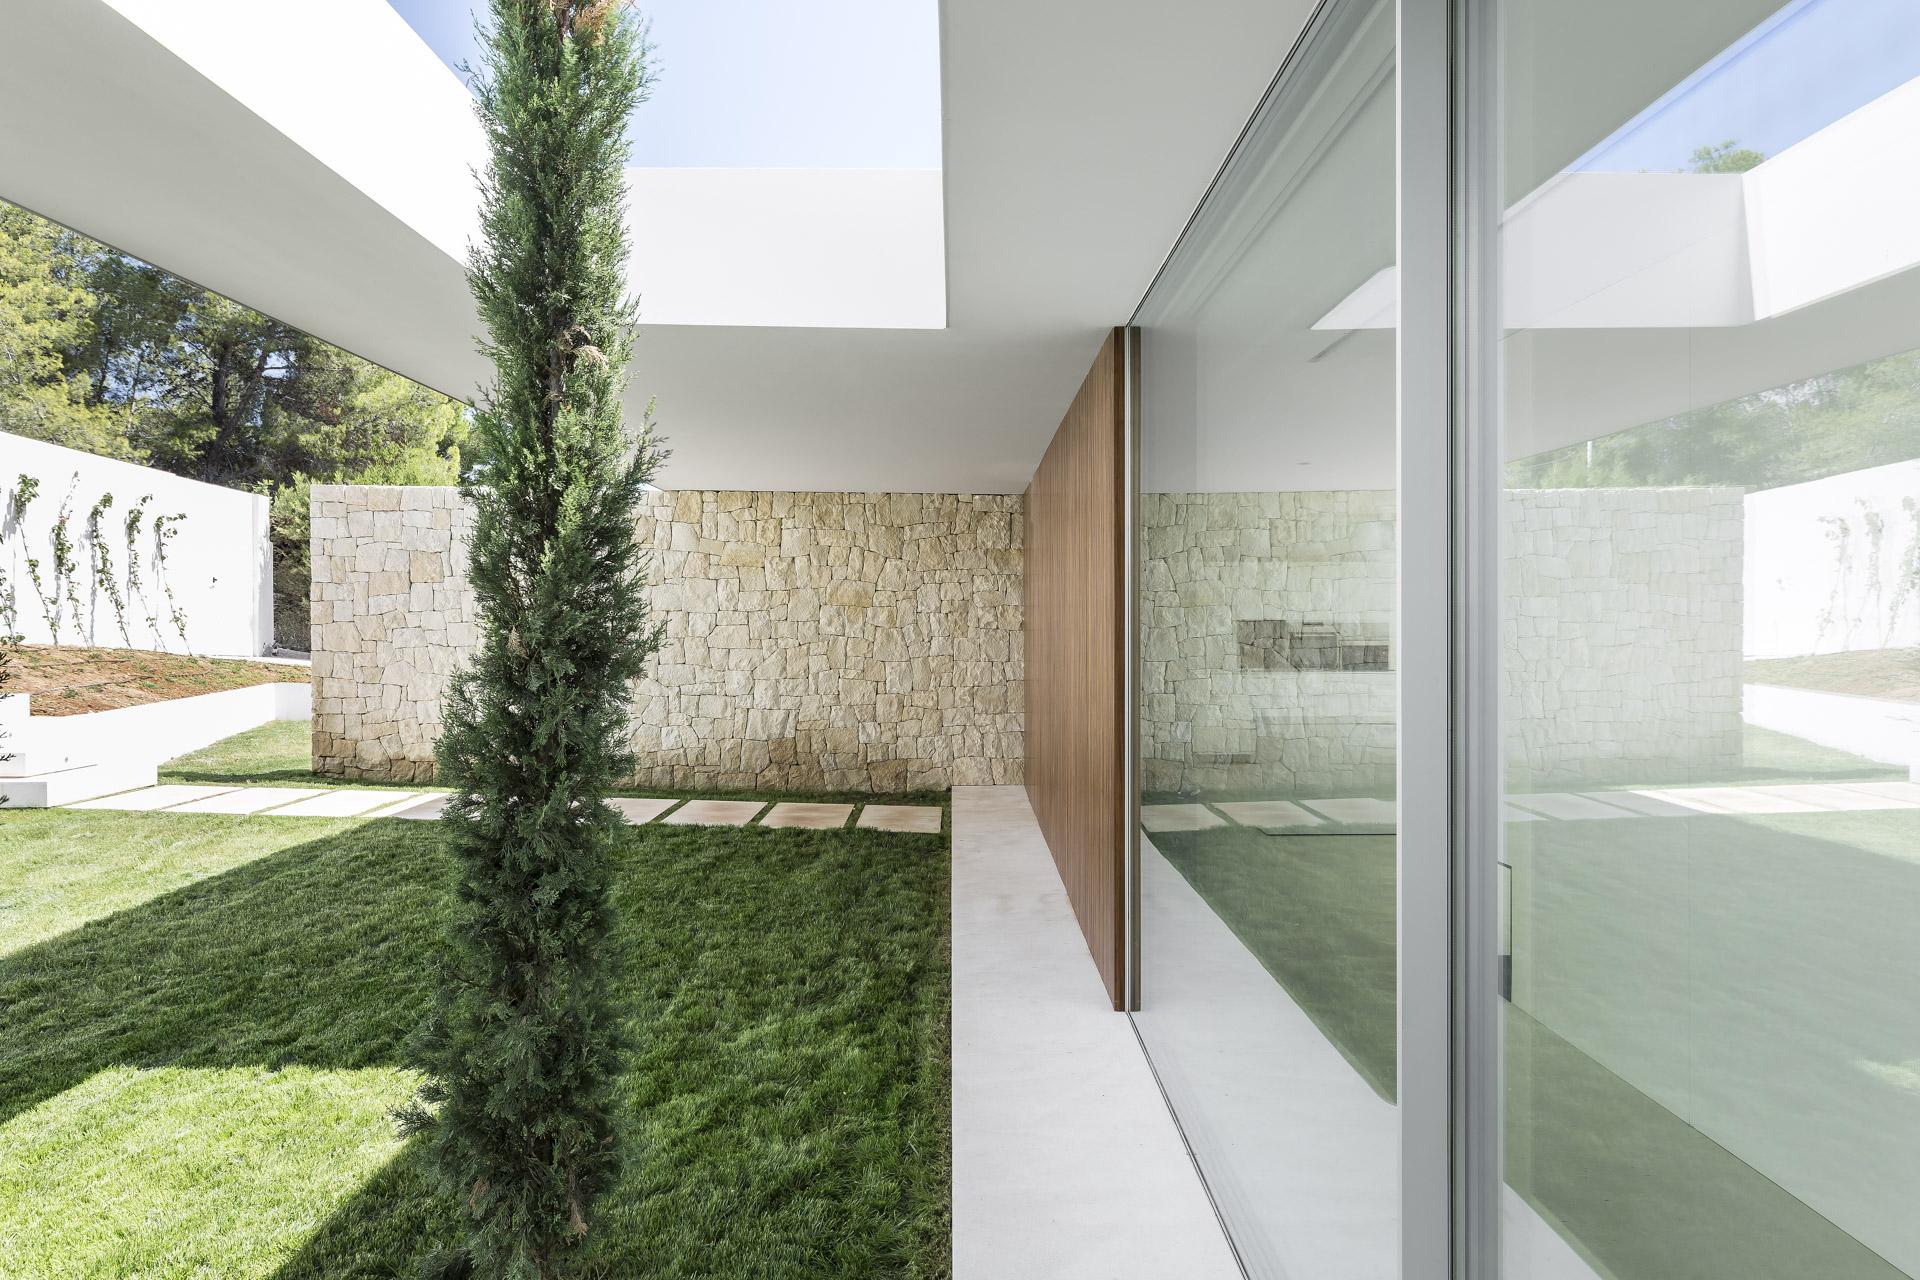 fotografia-arquitectura-valencia-german-cabo-gallardo-llopis-villamarchante-vivienda-09